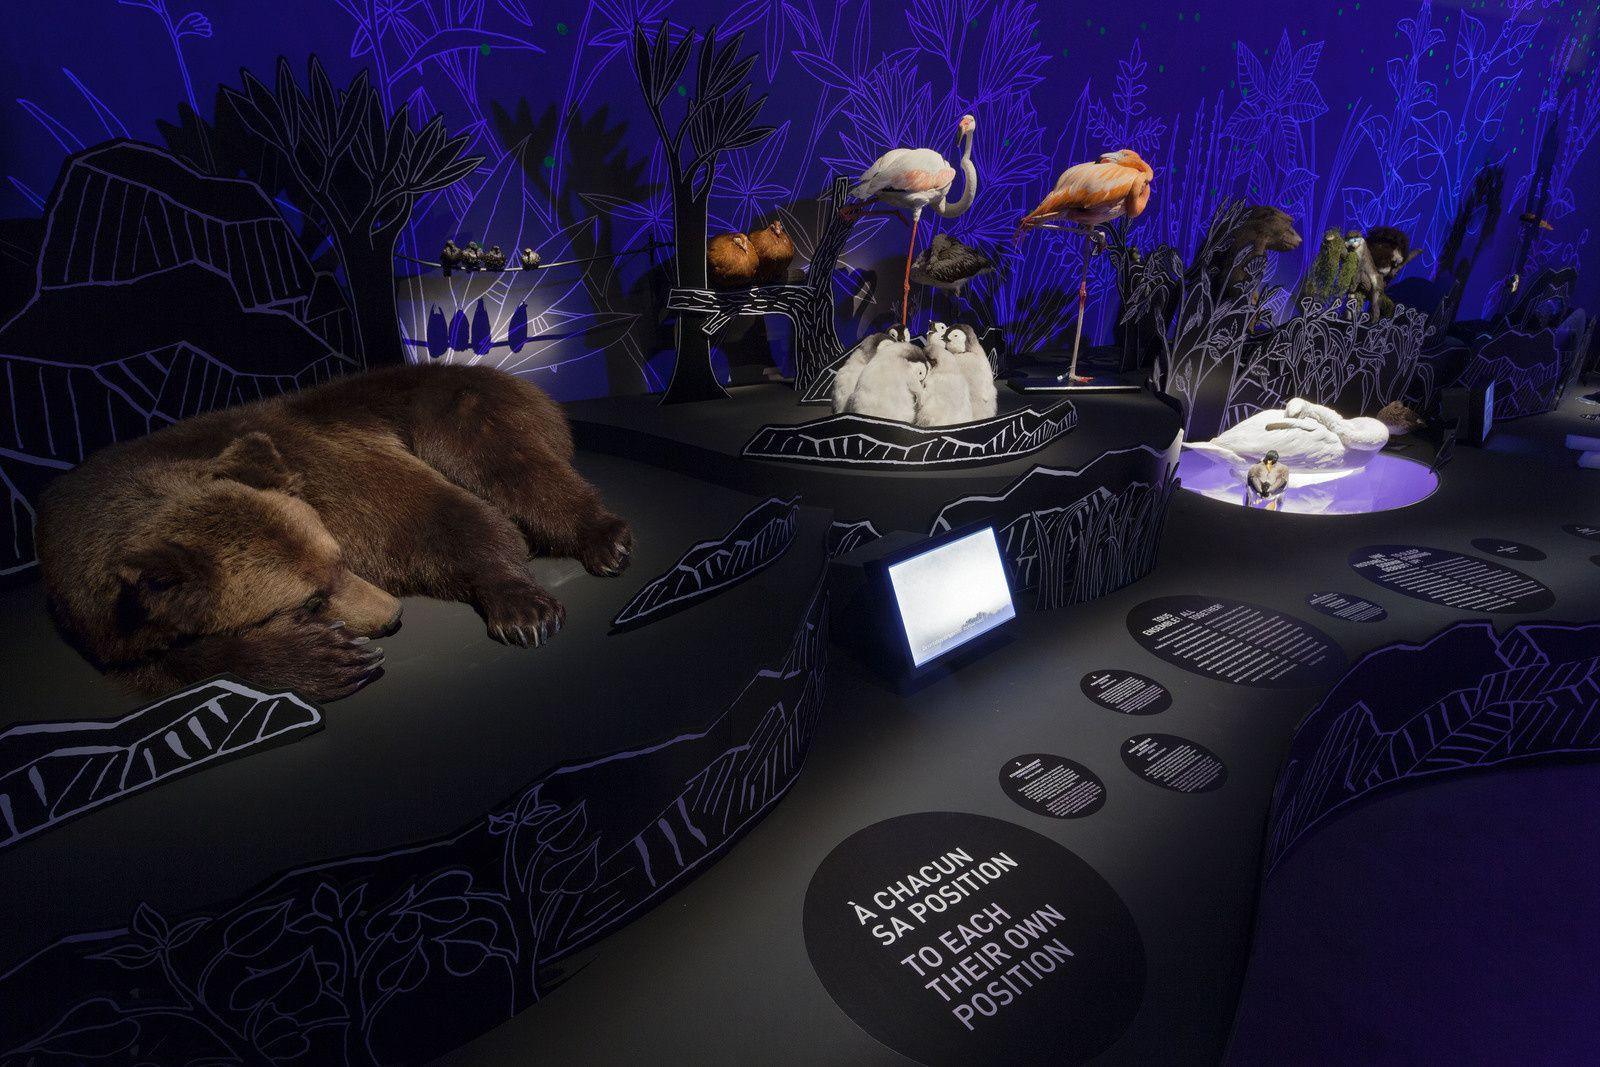 La Nuit au Muséum